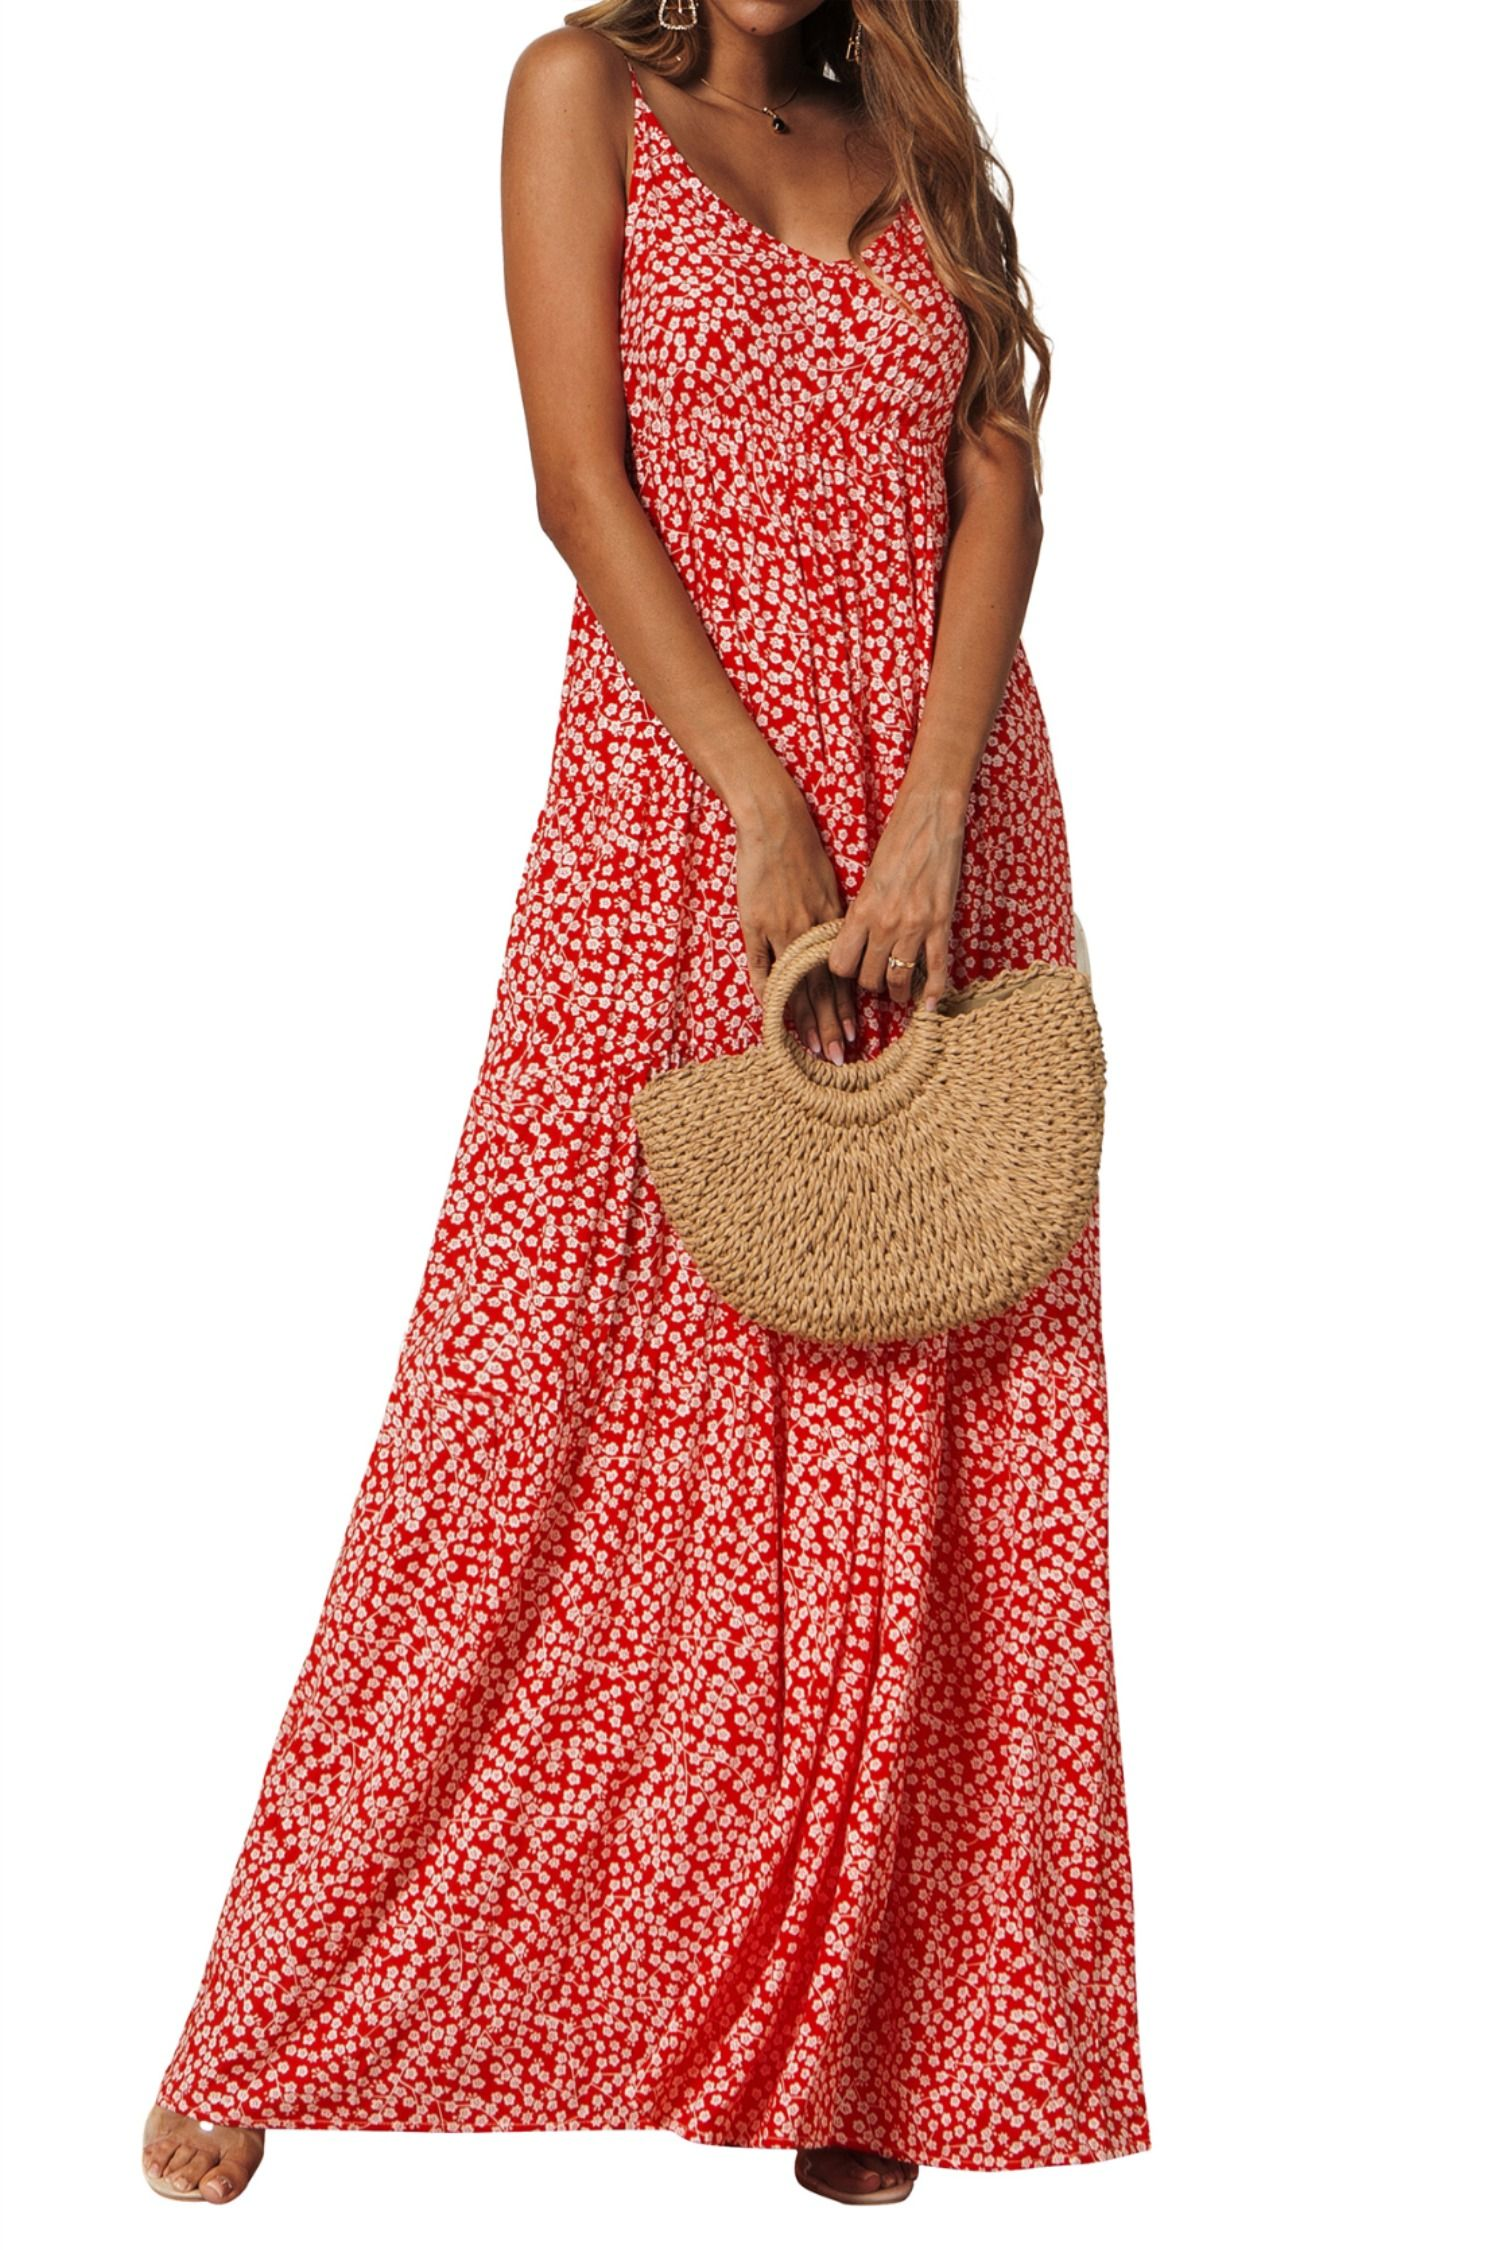 LADIES WOMENS Oversized Boho Floral Mini Dress Beach Casual Strappy Vest Dresses